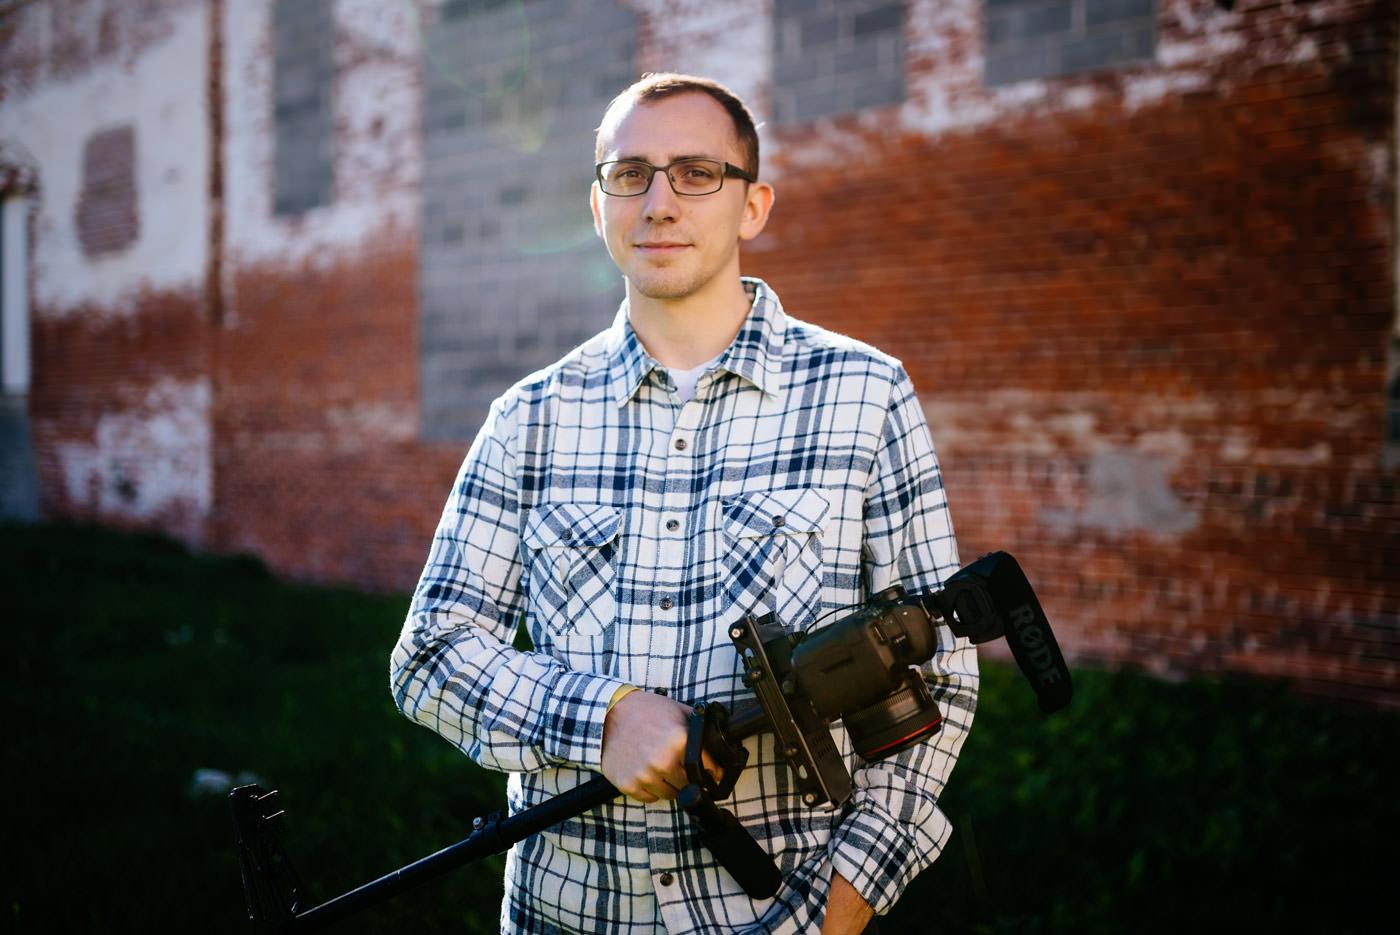 charleston wv videographer headshots